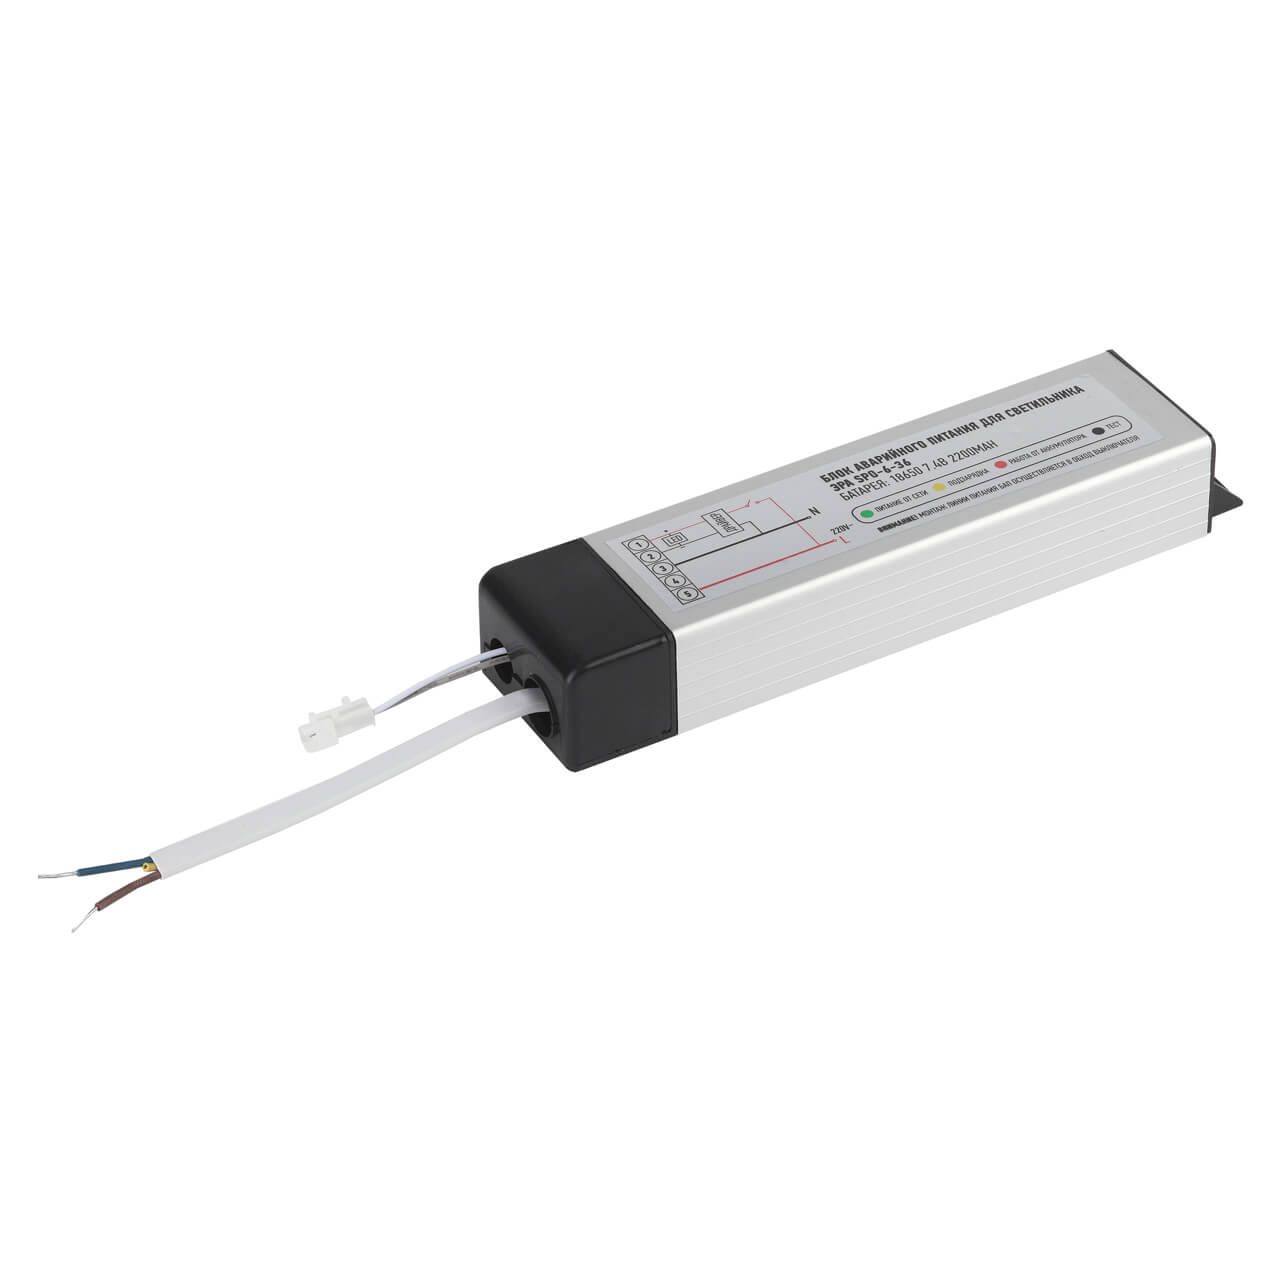 цена на Драйвер ЭРА LED-LP-SPO (A1)